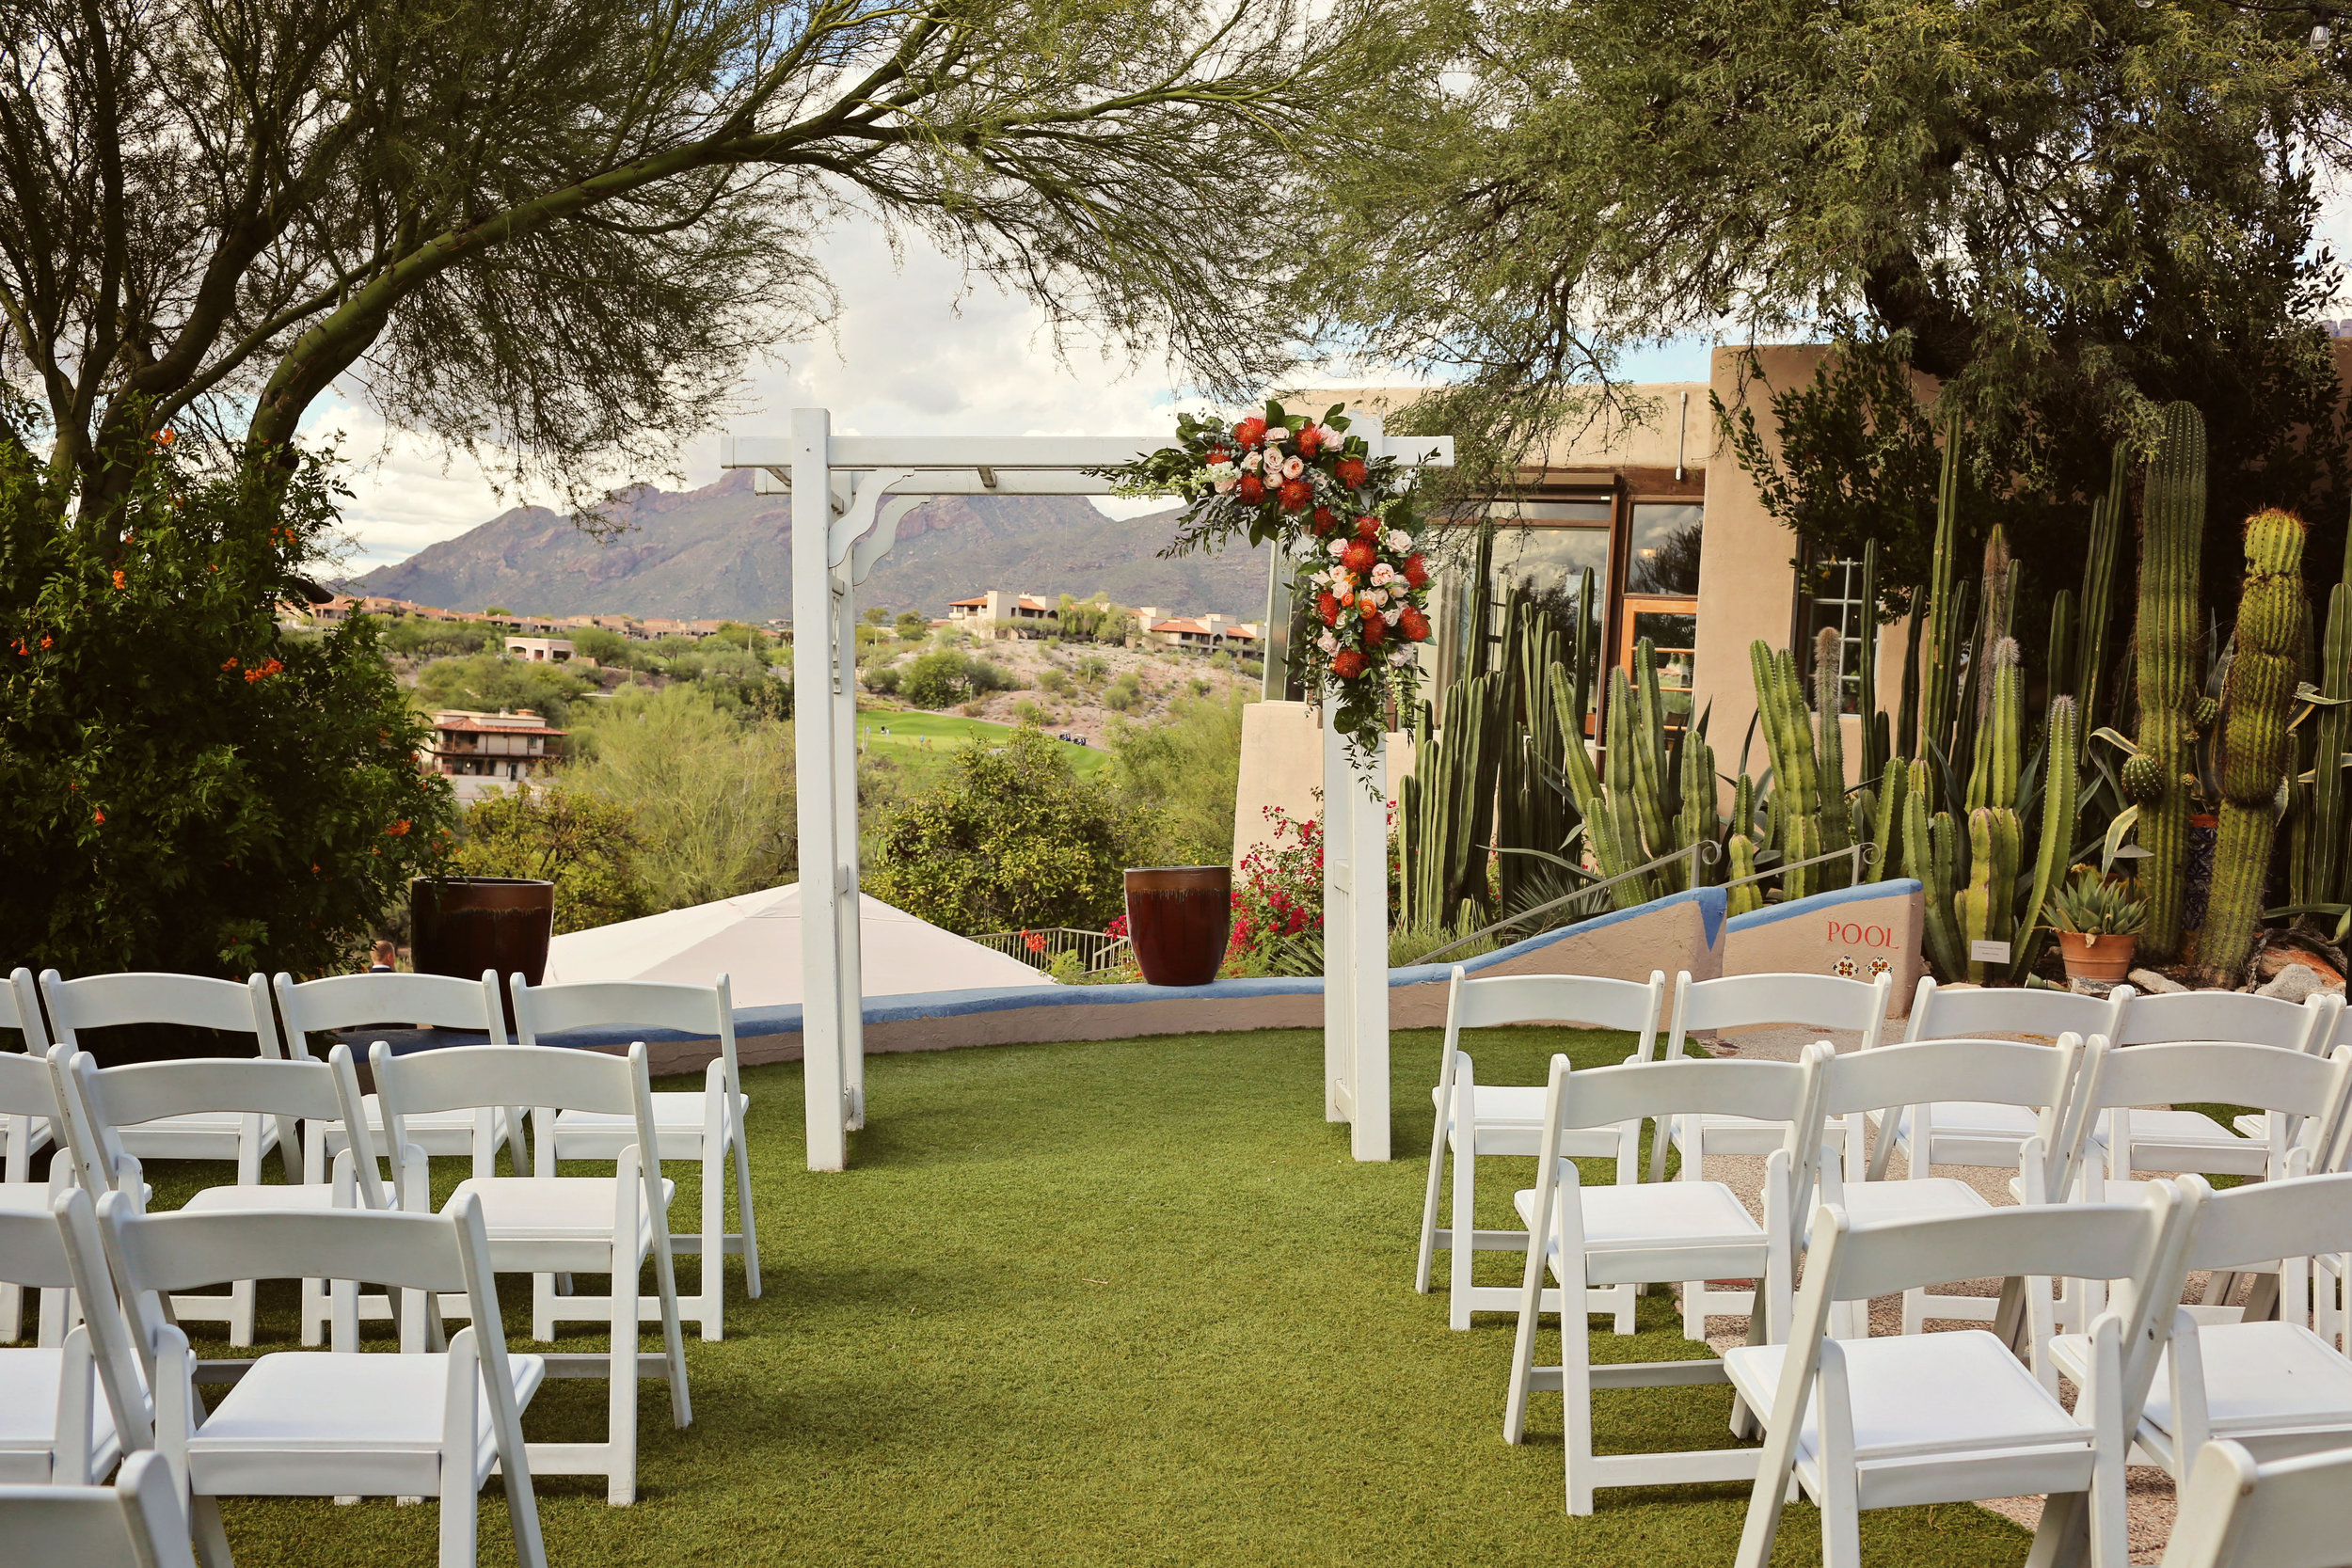 Tucson_CeremonySetup.jpg